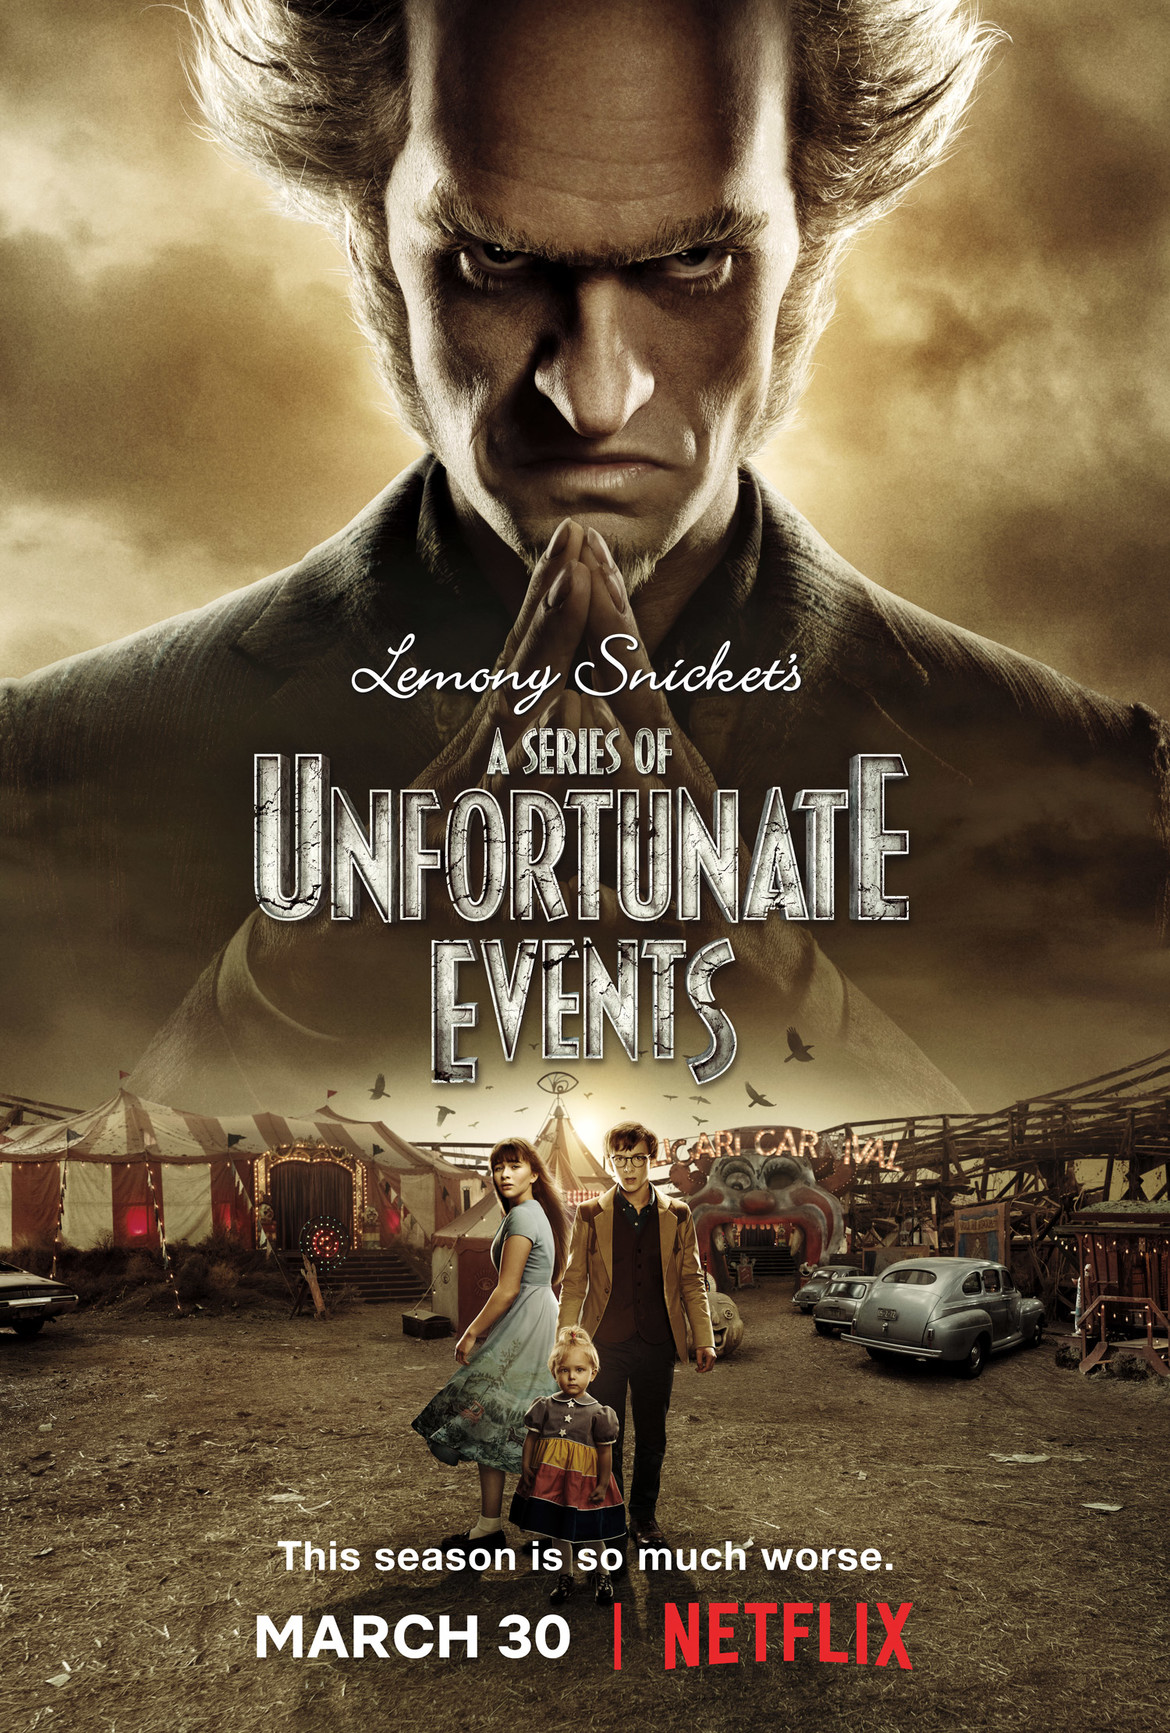 a_series_of_unfortunate_events_season_2_key_art.jpg